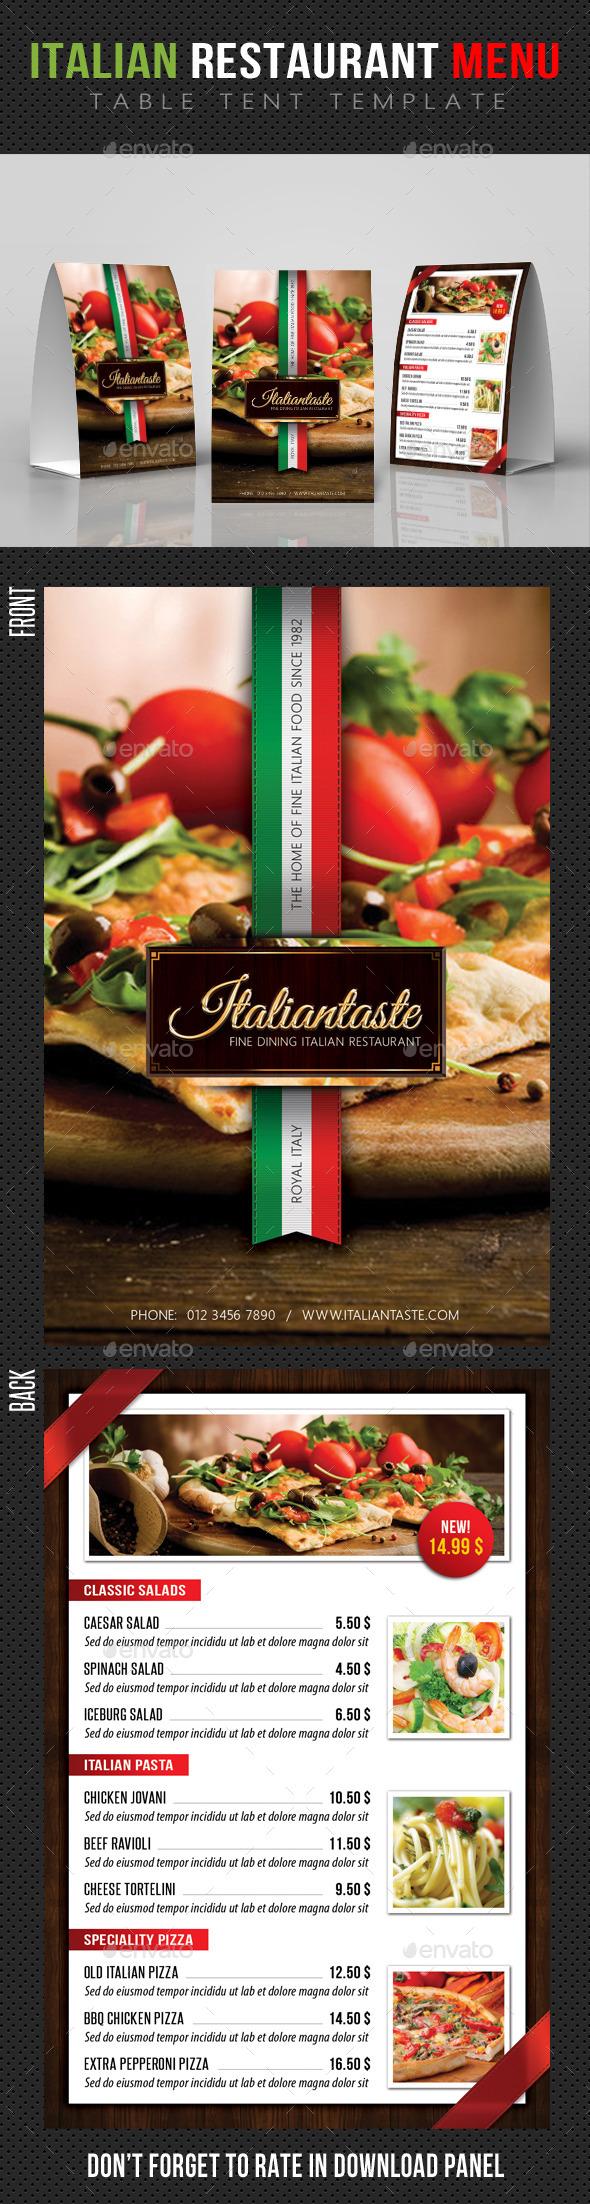 Italian Restaurant Table Tent Template